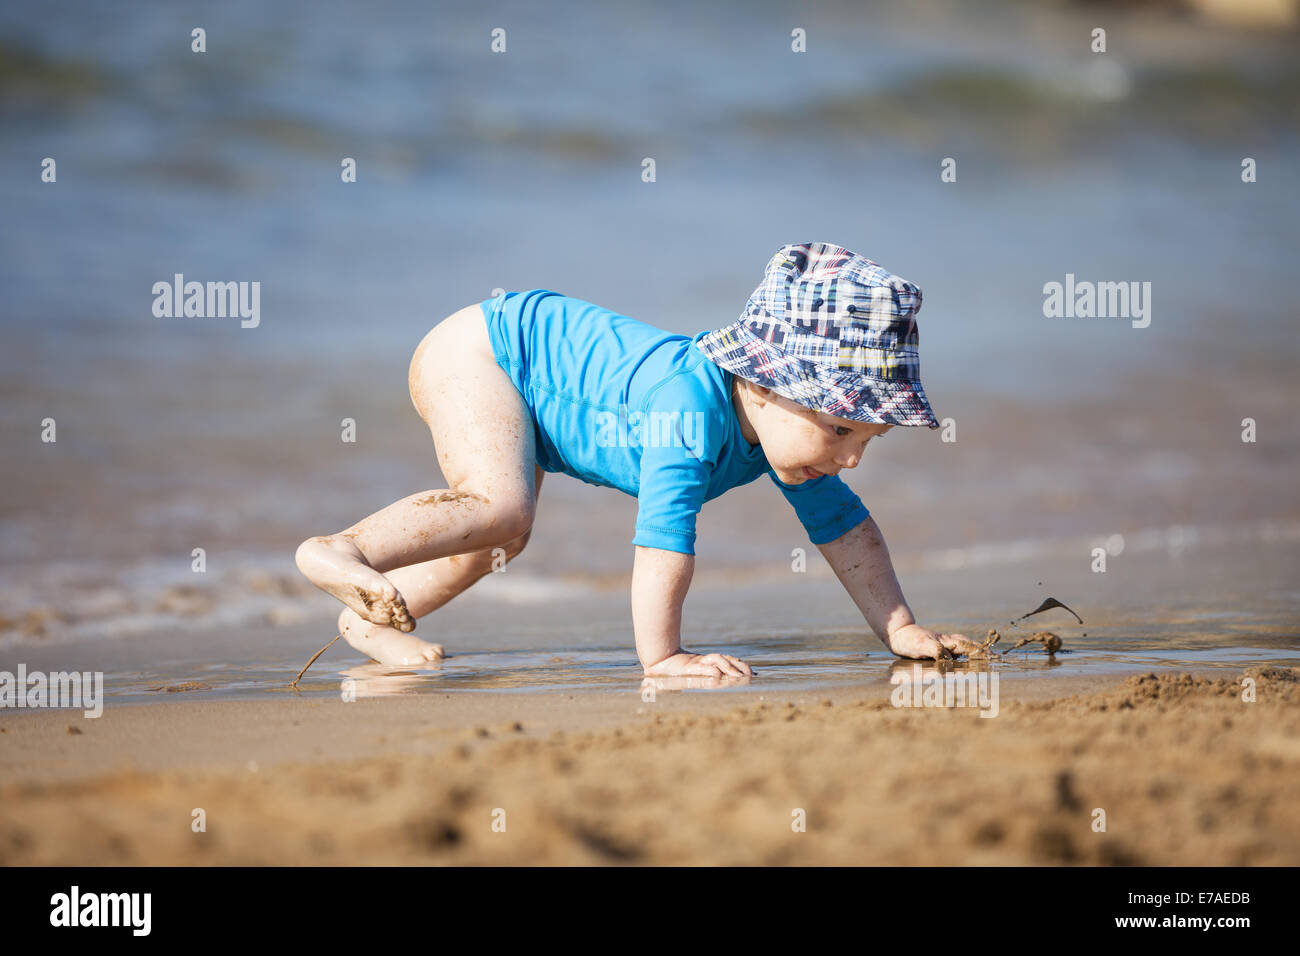 Small boy crawling towards water at the beach - Stock Image